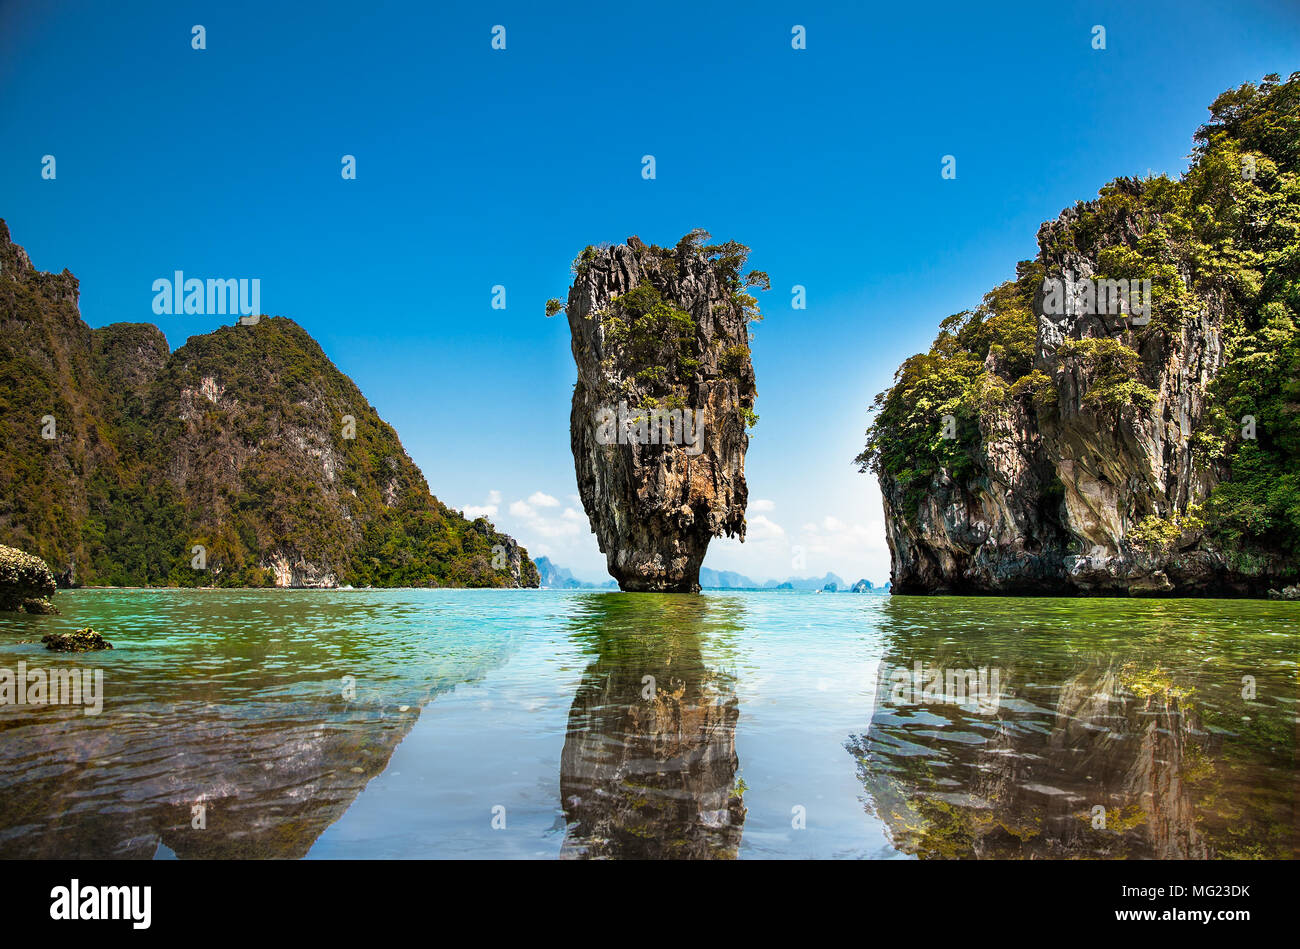 Khao Phing Kan oder Ko Tapu Insel in Thailand in der Nähe